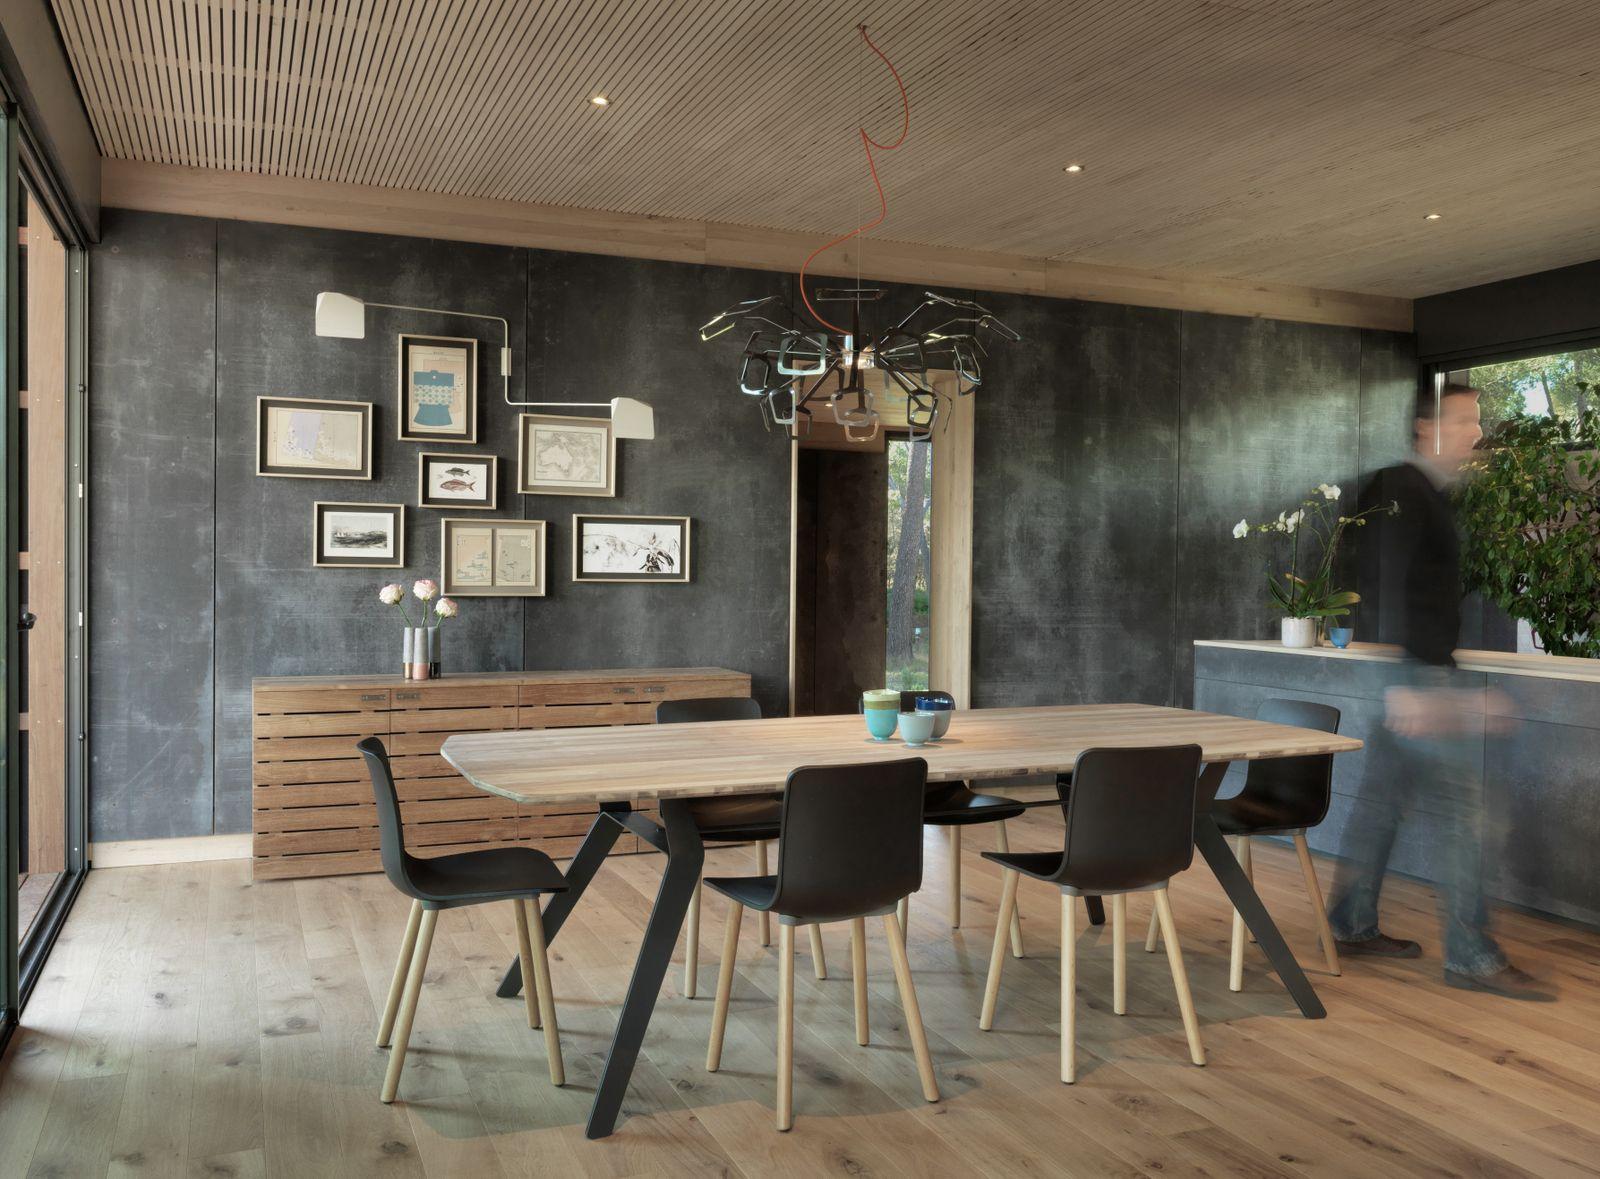 Multipod Studio Pop Up House Fonda Lashay Design Spaces